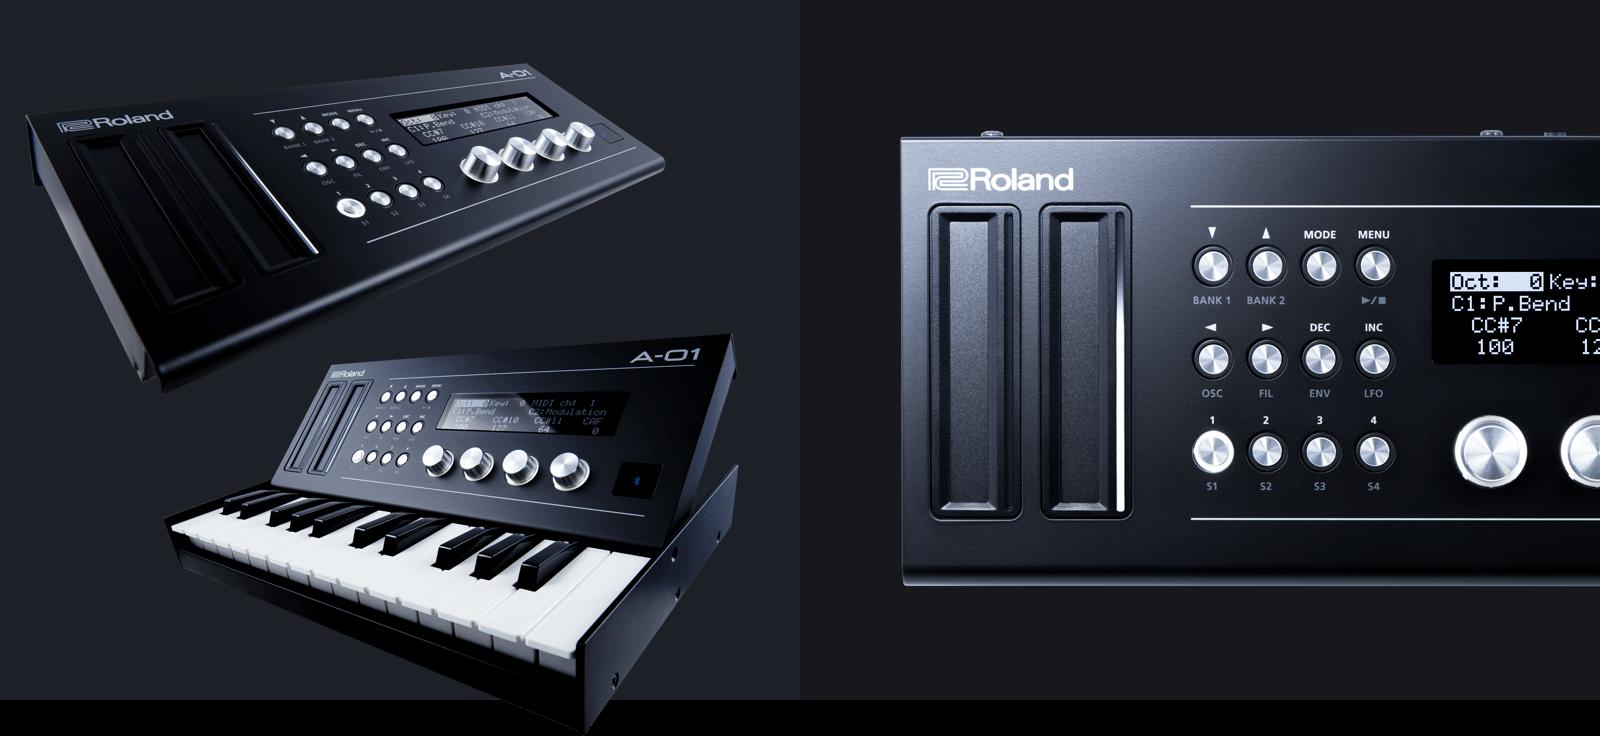 Roland A-01, controlador y motor de sonido de bolsillo (NAMM 2016)